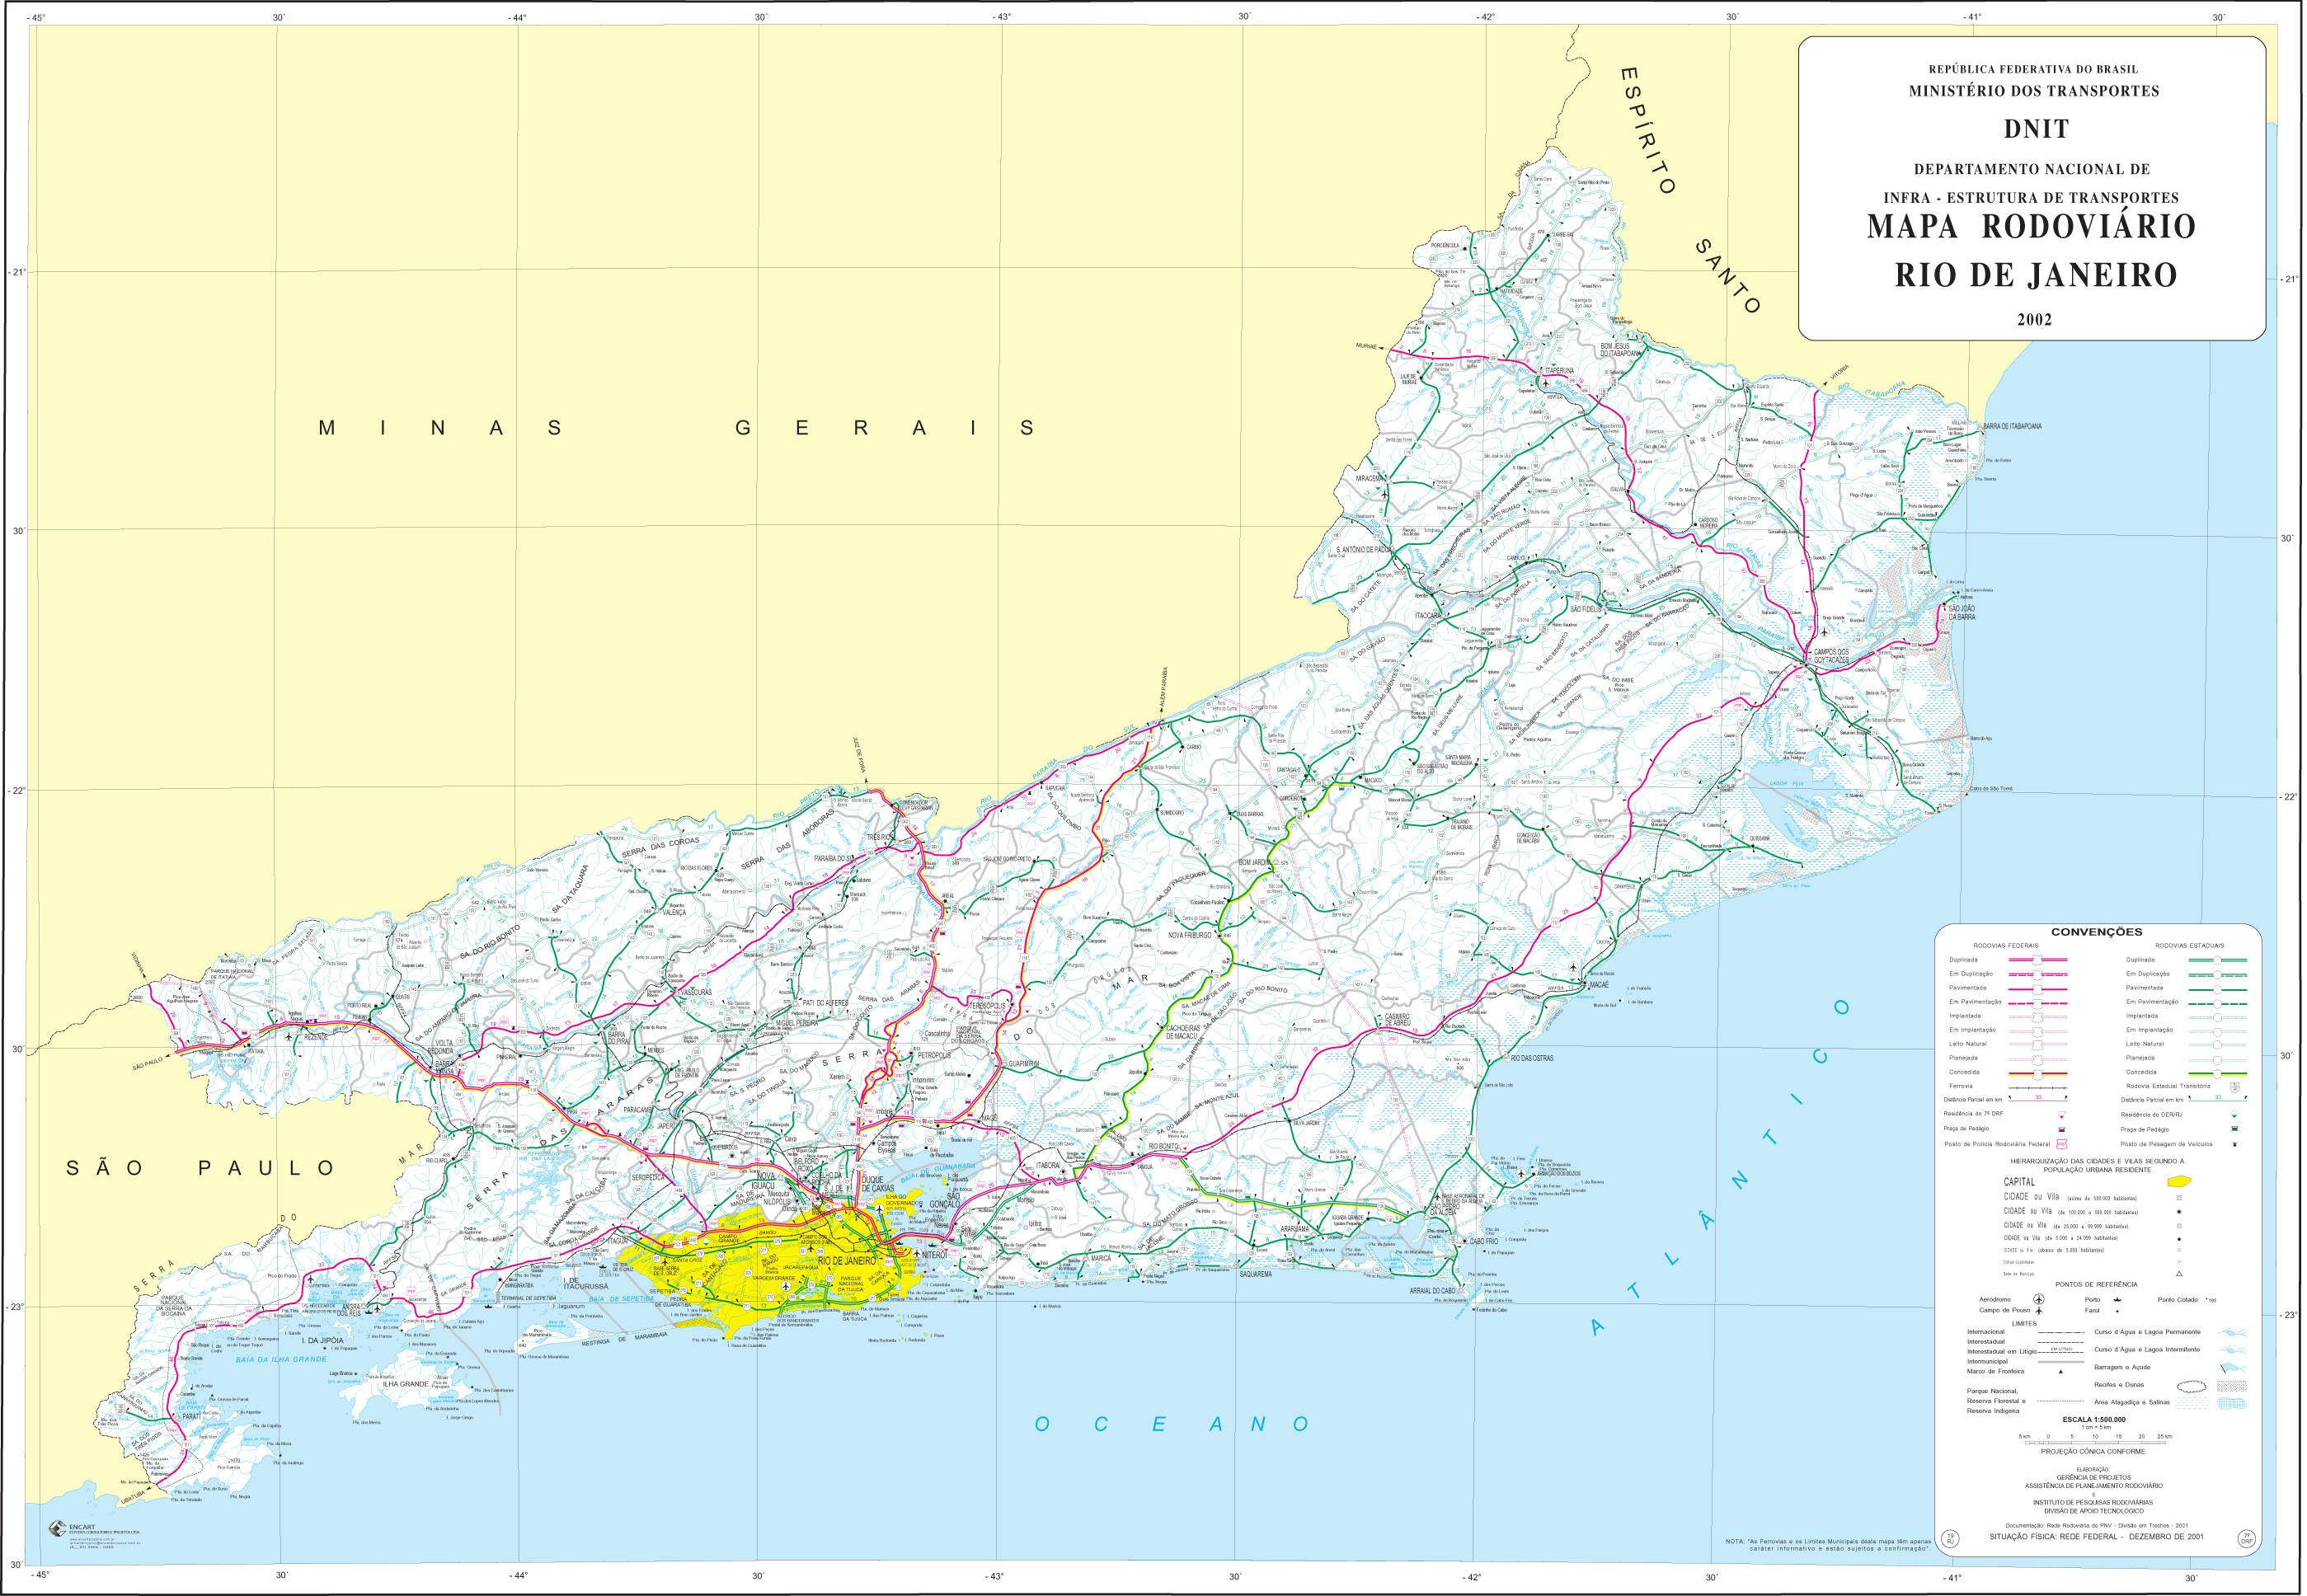 Rio de Janeiro Road Map, Brazil